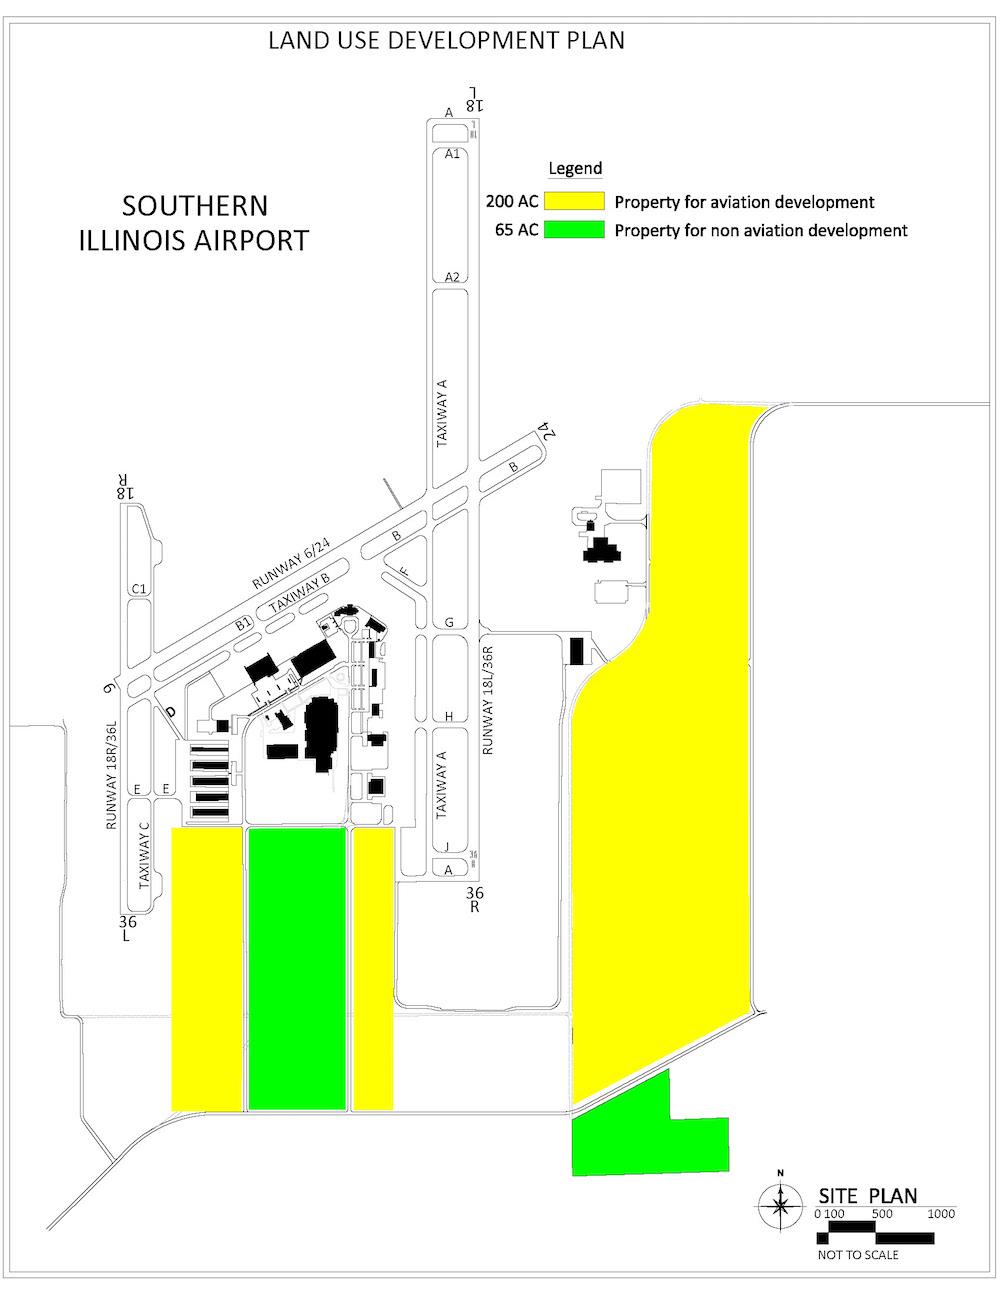 Tech Park | Southern Illinois Airport - 20160829 Land Use Plan